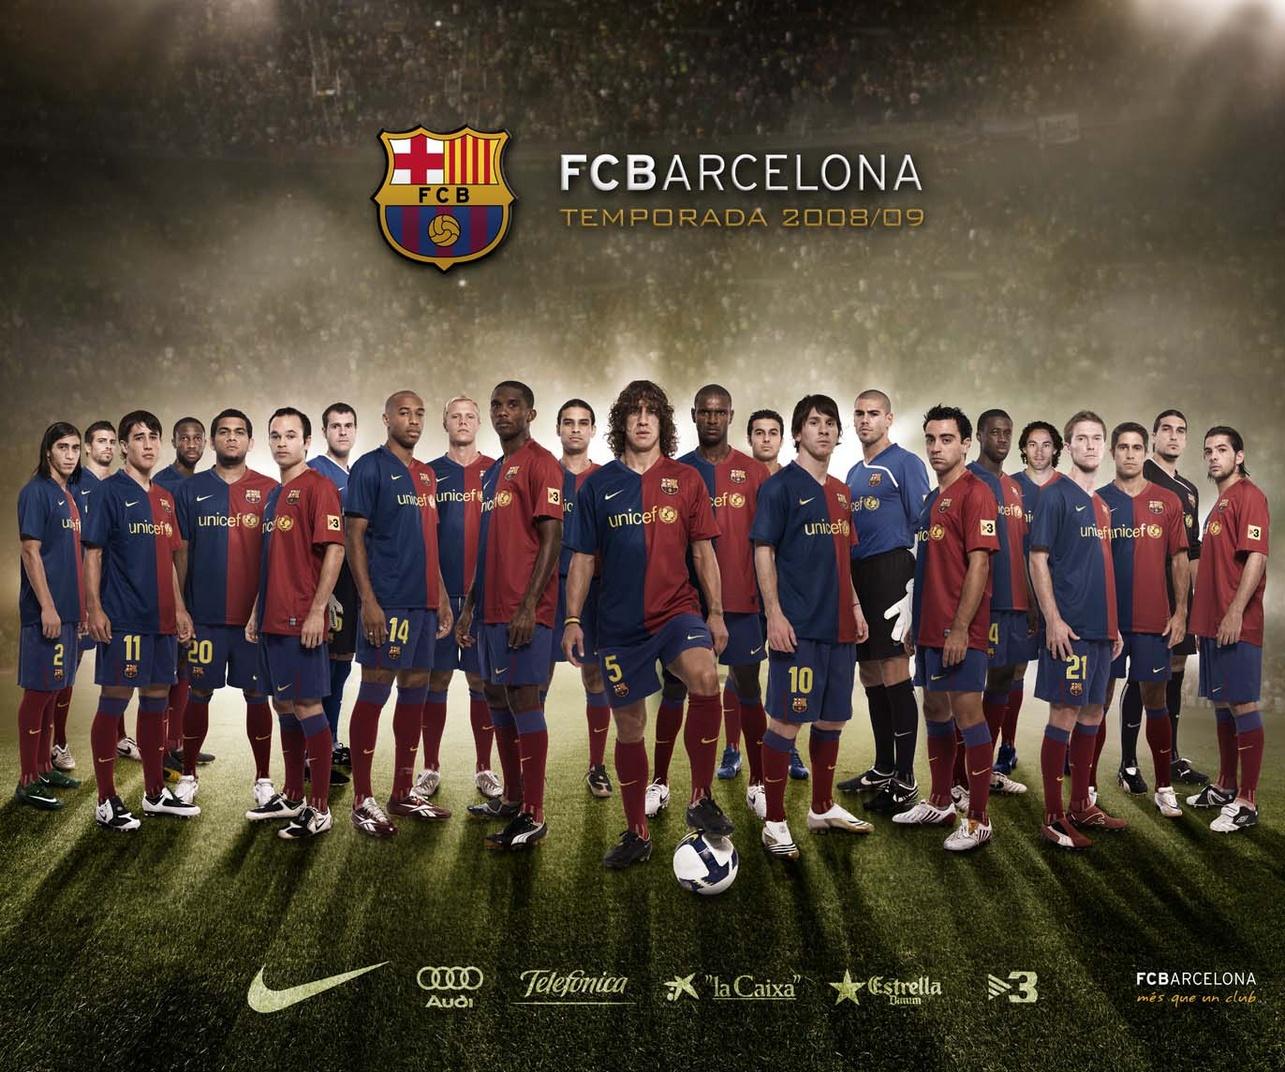 best football team